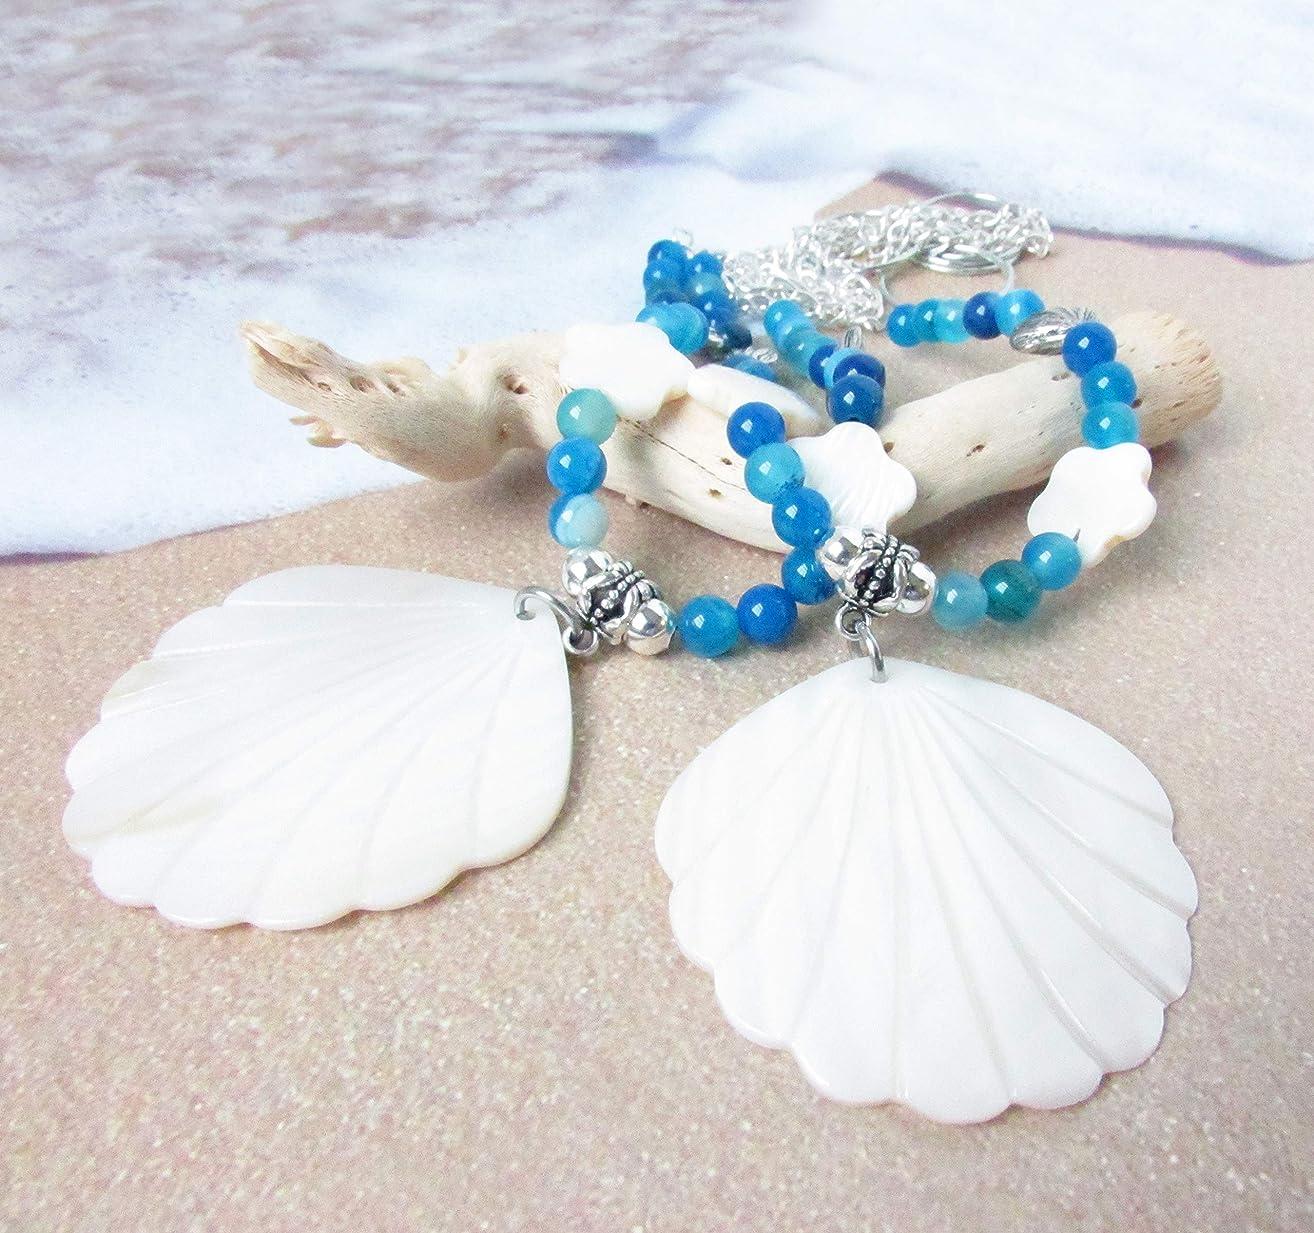 Tropical Drapery Tiebacks with White Scallop Shell Pendants